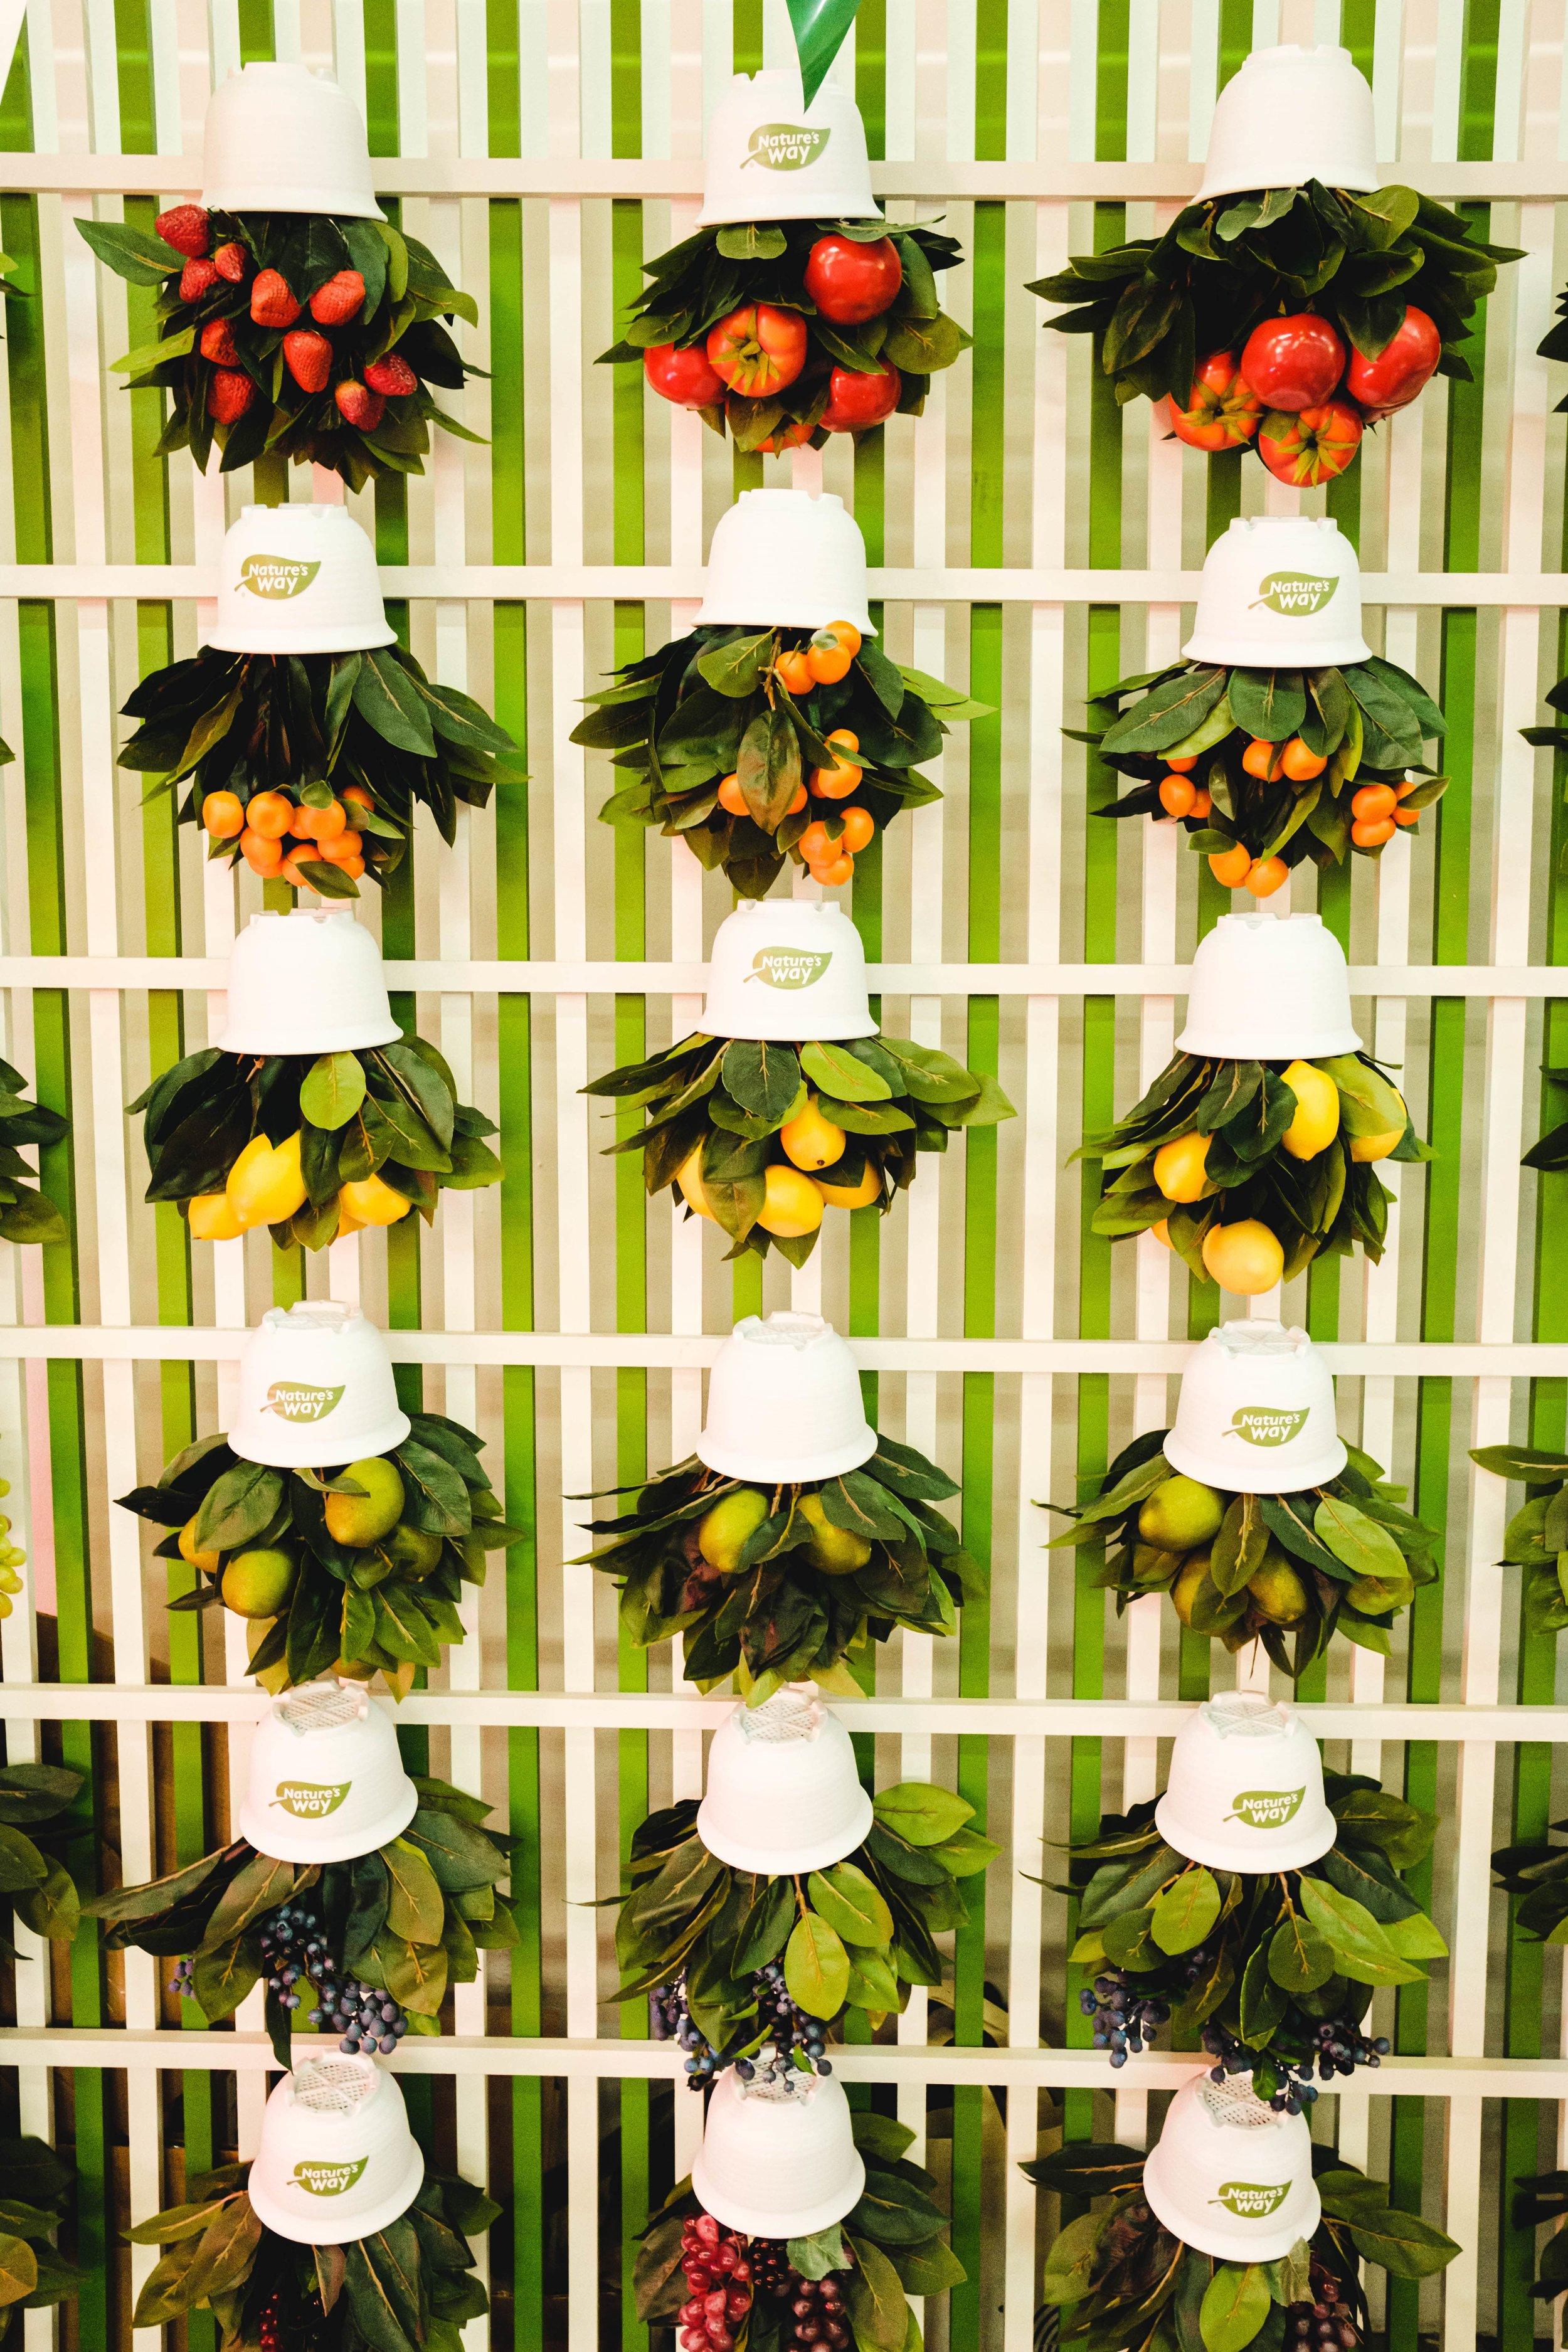 Nature's Way Planter Install